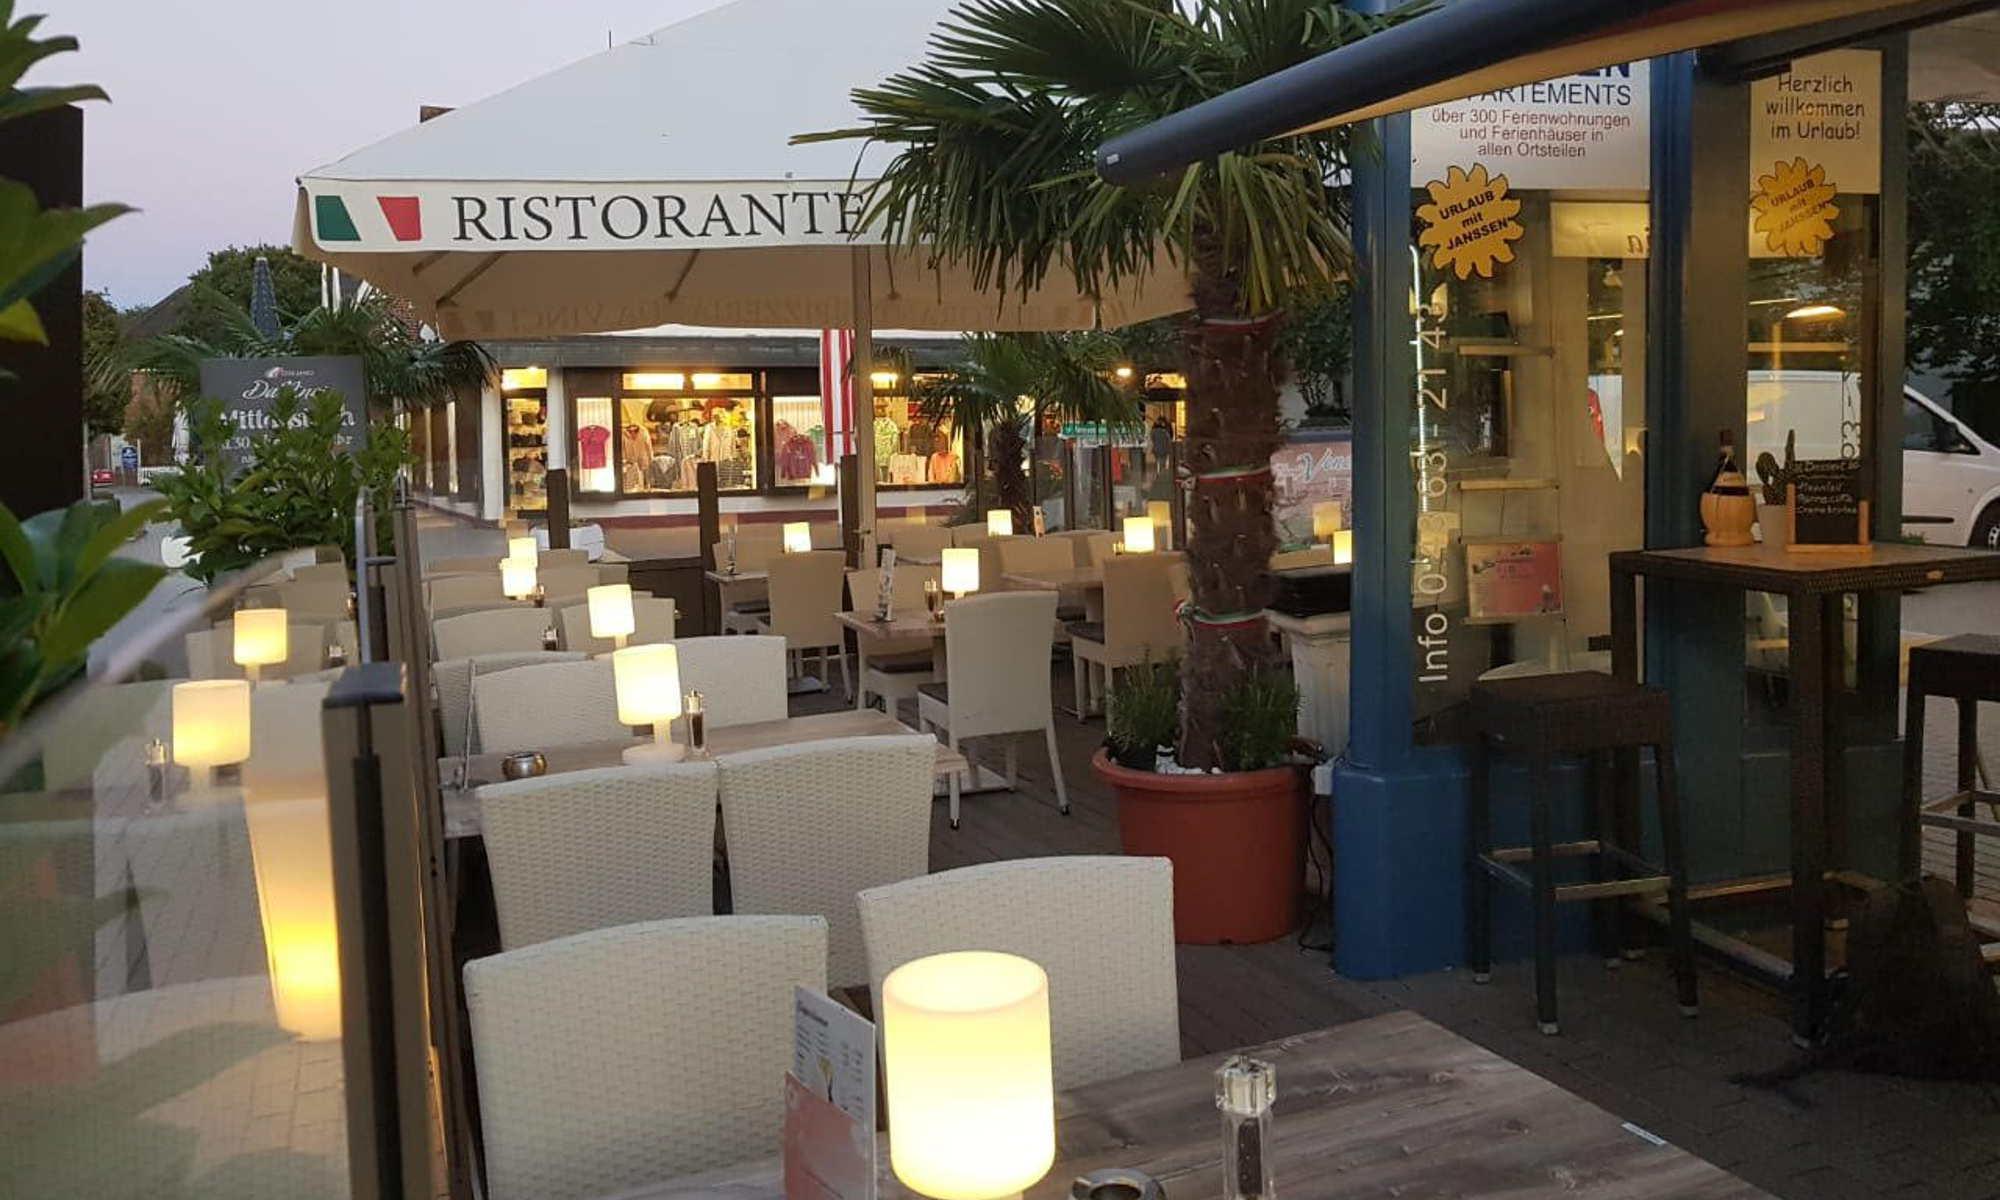 Ristorante Pizzeria Da Vinci St. Peter-Ording